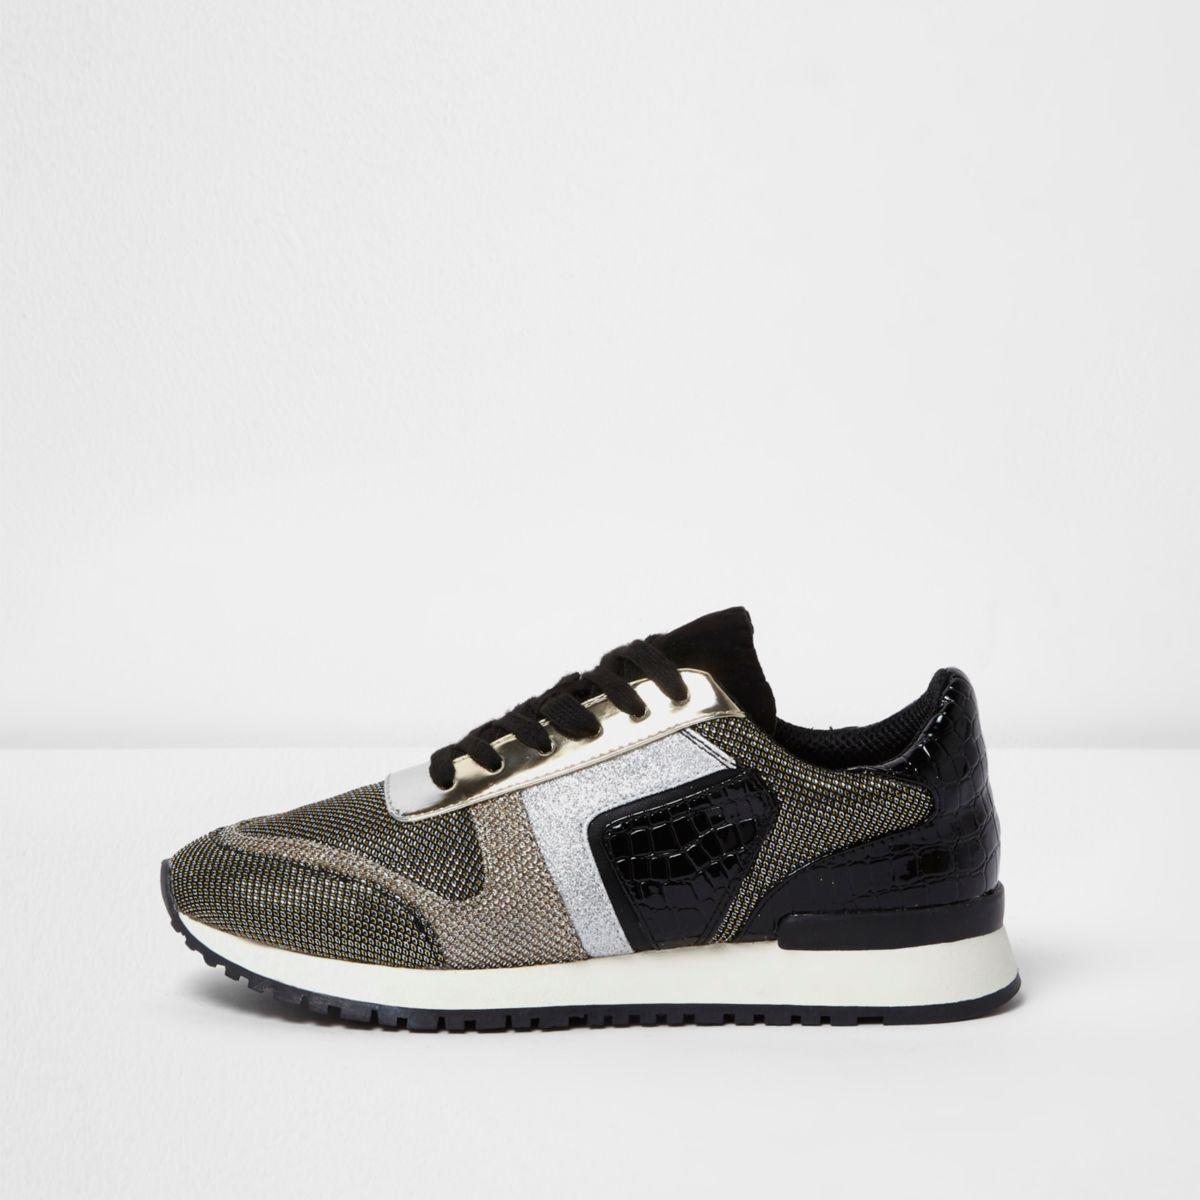 Black metallic croc lace-up runner sneakers